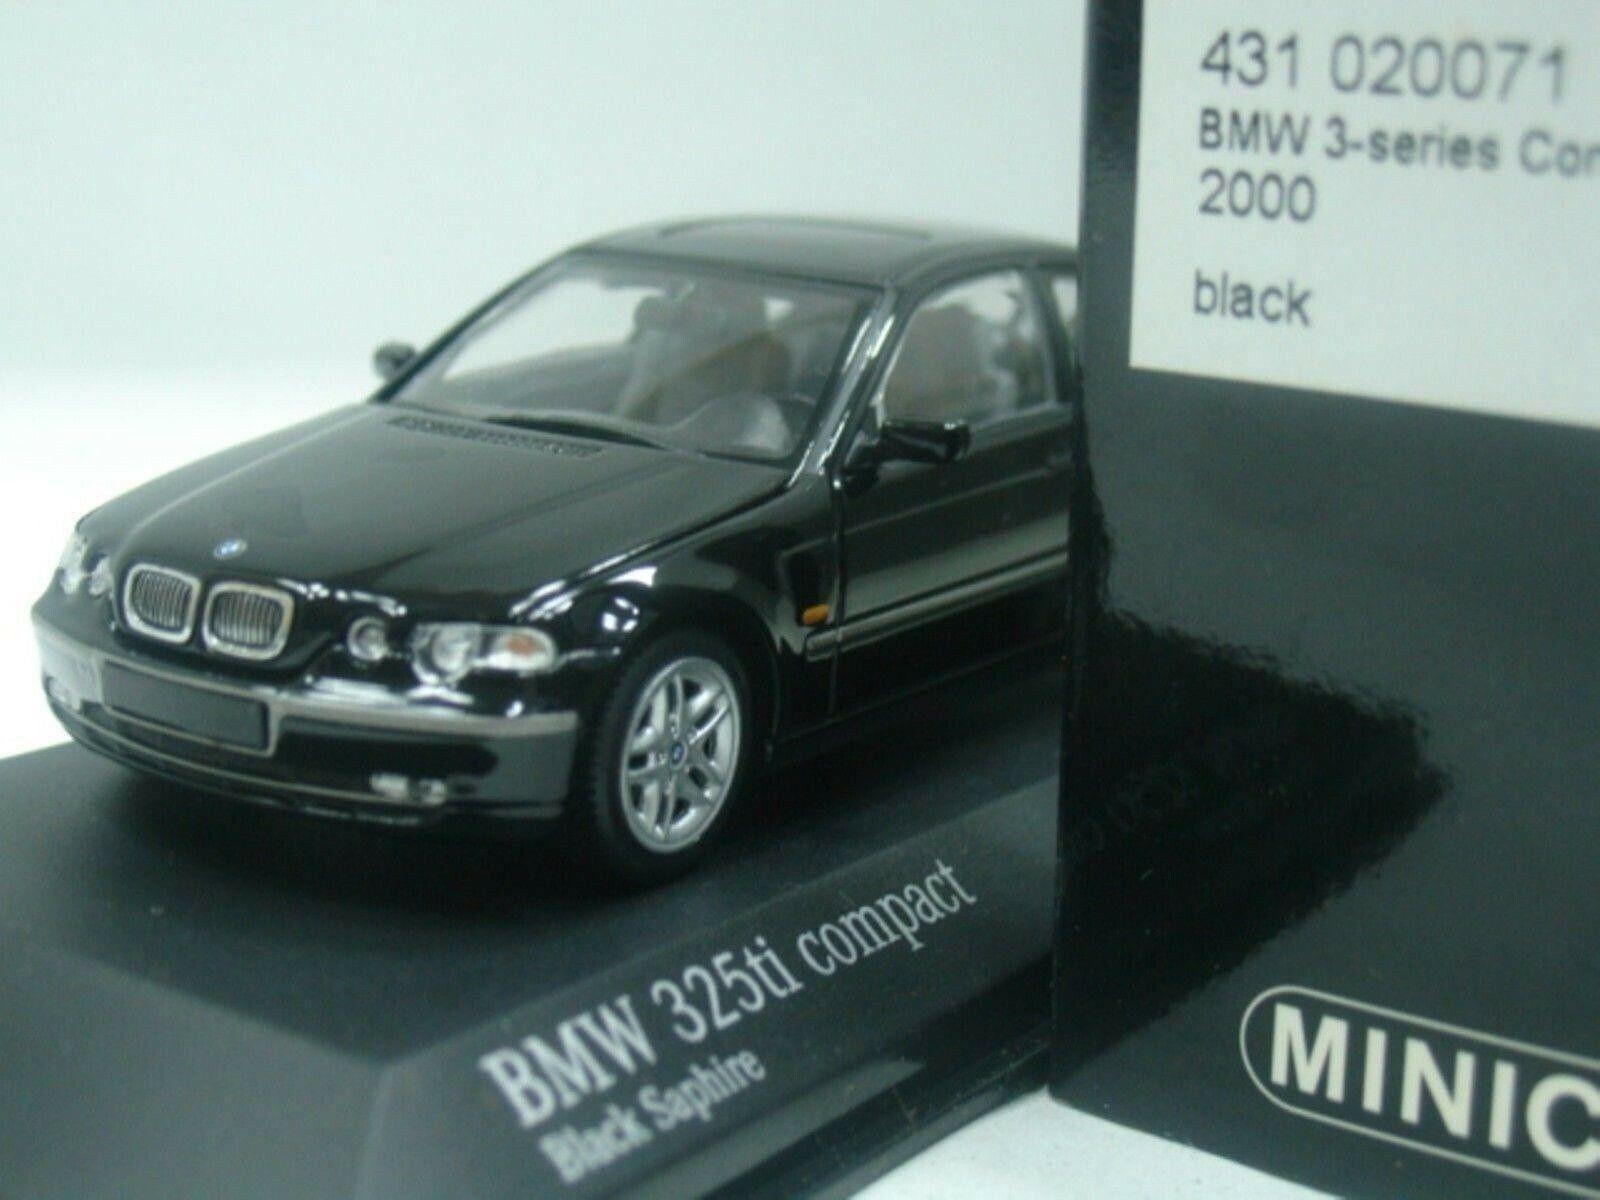 Wow extrêmement rare BMW E46 325ti Compact 2.5 L 24 V 2000 Noir 1 43 Minichamps-GTR